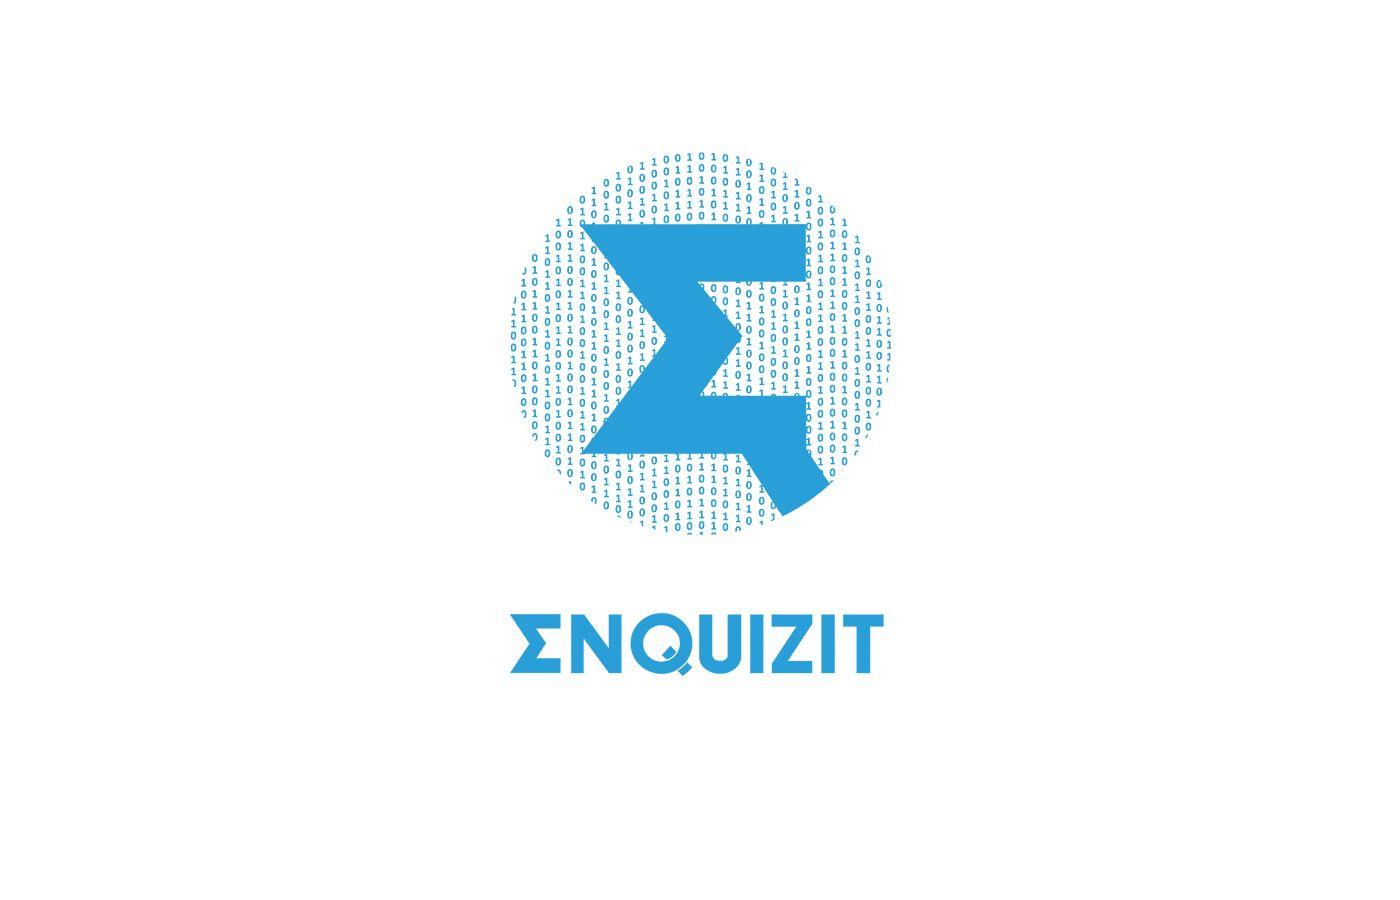 Oznakomtes S Etim Proektom Behance Enquizit The Best Mind In Cloud Solutions Https Www Behance Net Gallery 53801723 Enqu Solutions Mindfulness Clouds